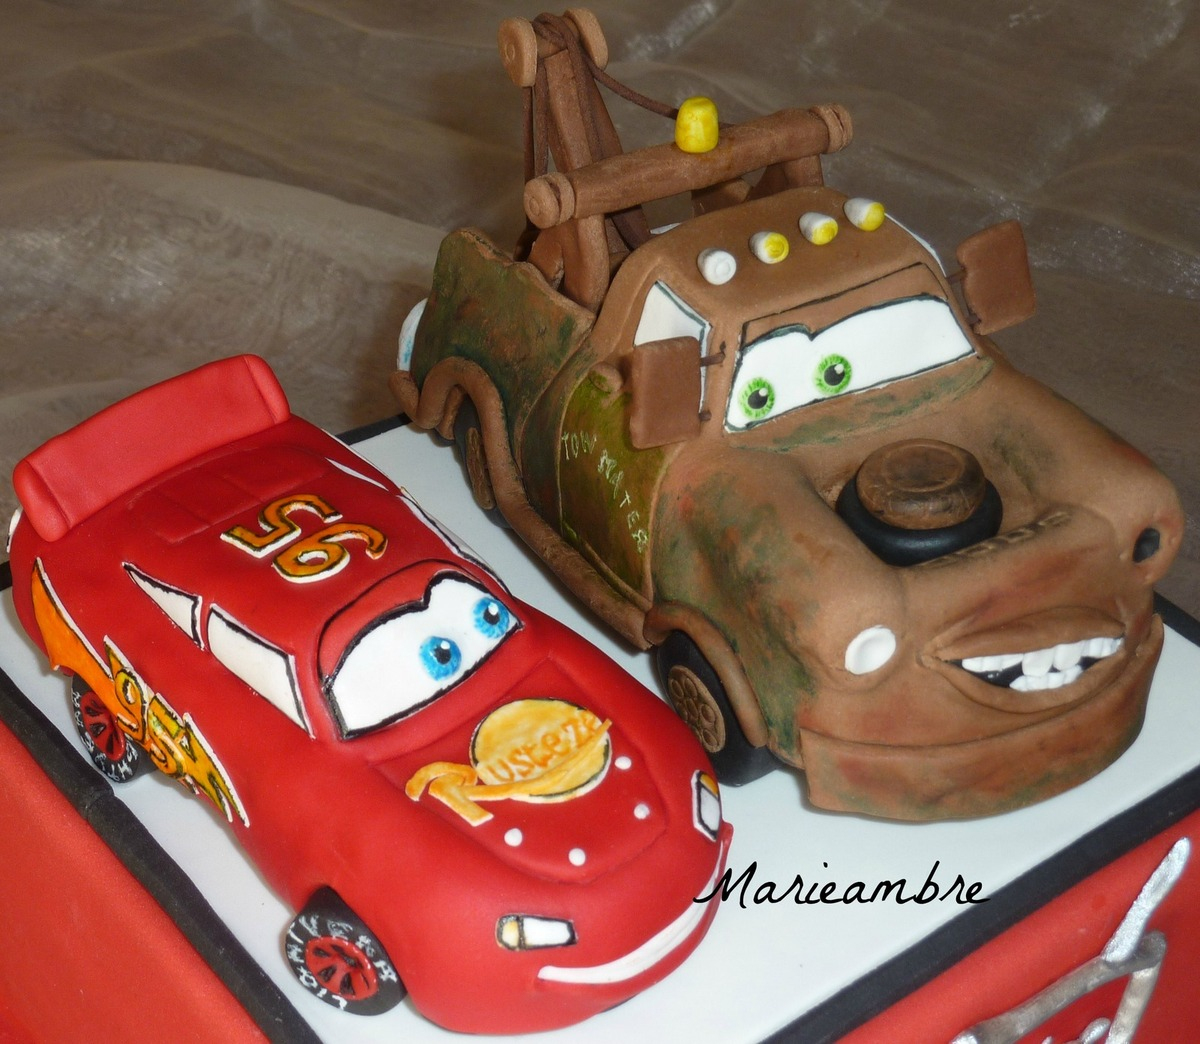 Modelage Martin Et Flash Mcqueen (Cars) - Le Blog De Marieambre concernant Flash Mcqueen Martin